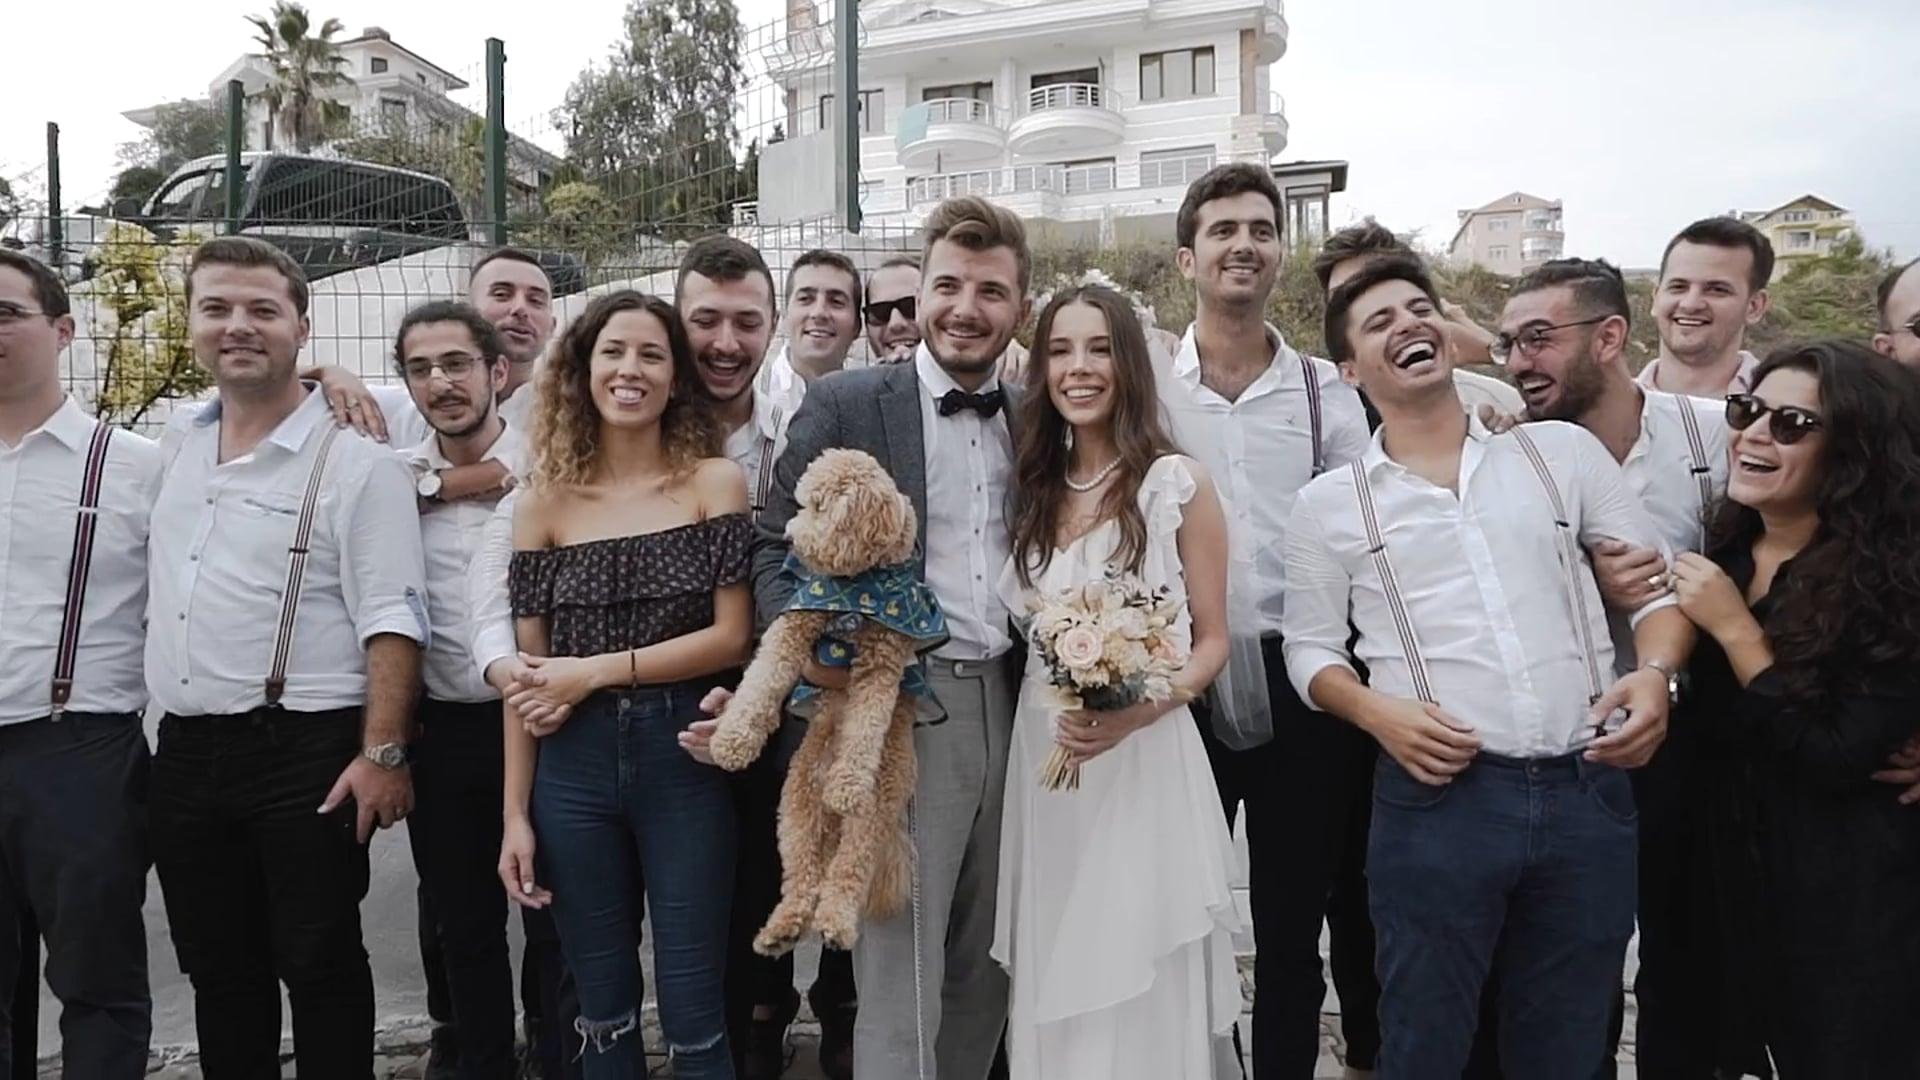 NİHAN + AHMET / Wedding Video by Fotoğraf Dükkanı